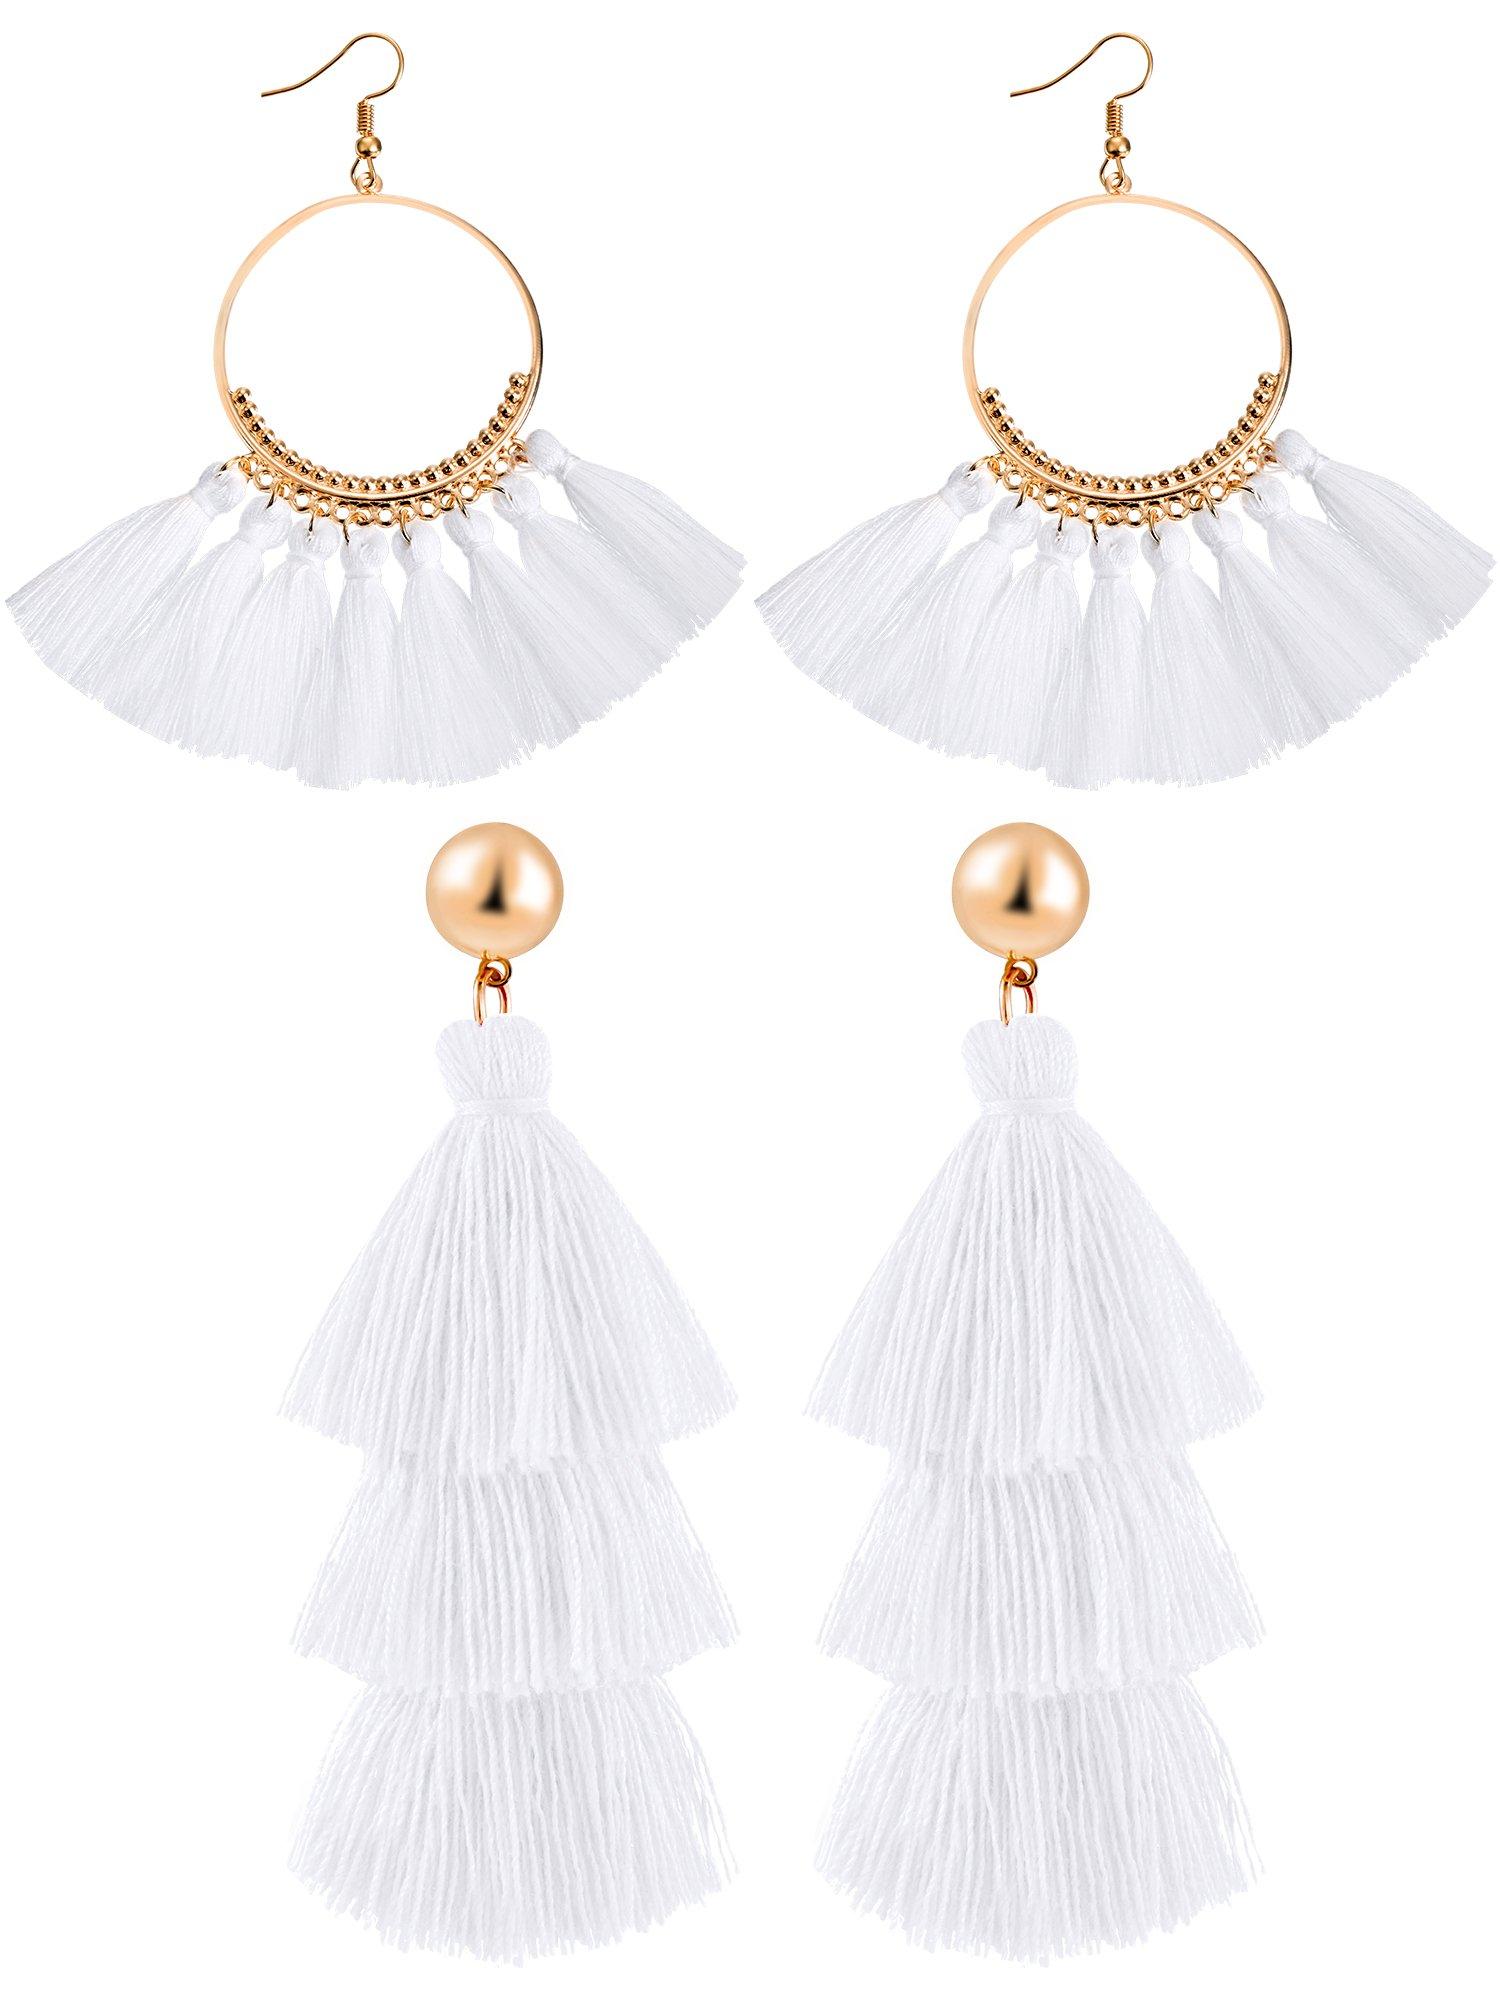 Hestya 2 Pairs Tassel Earrings for Women Girls Handmade 3 Tiered Tassel Dangle Earrings and Gold Hoop Earrings (White)